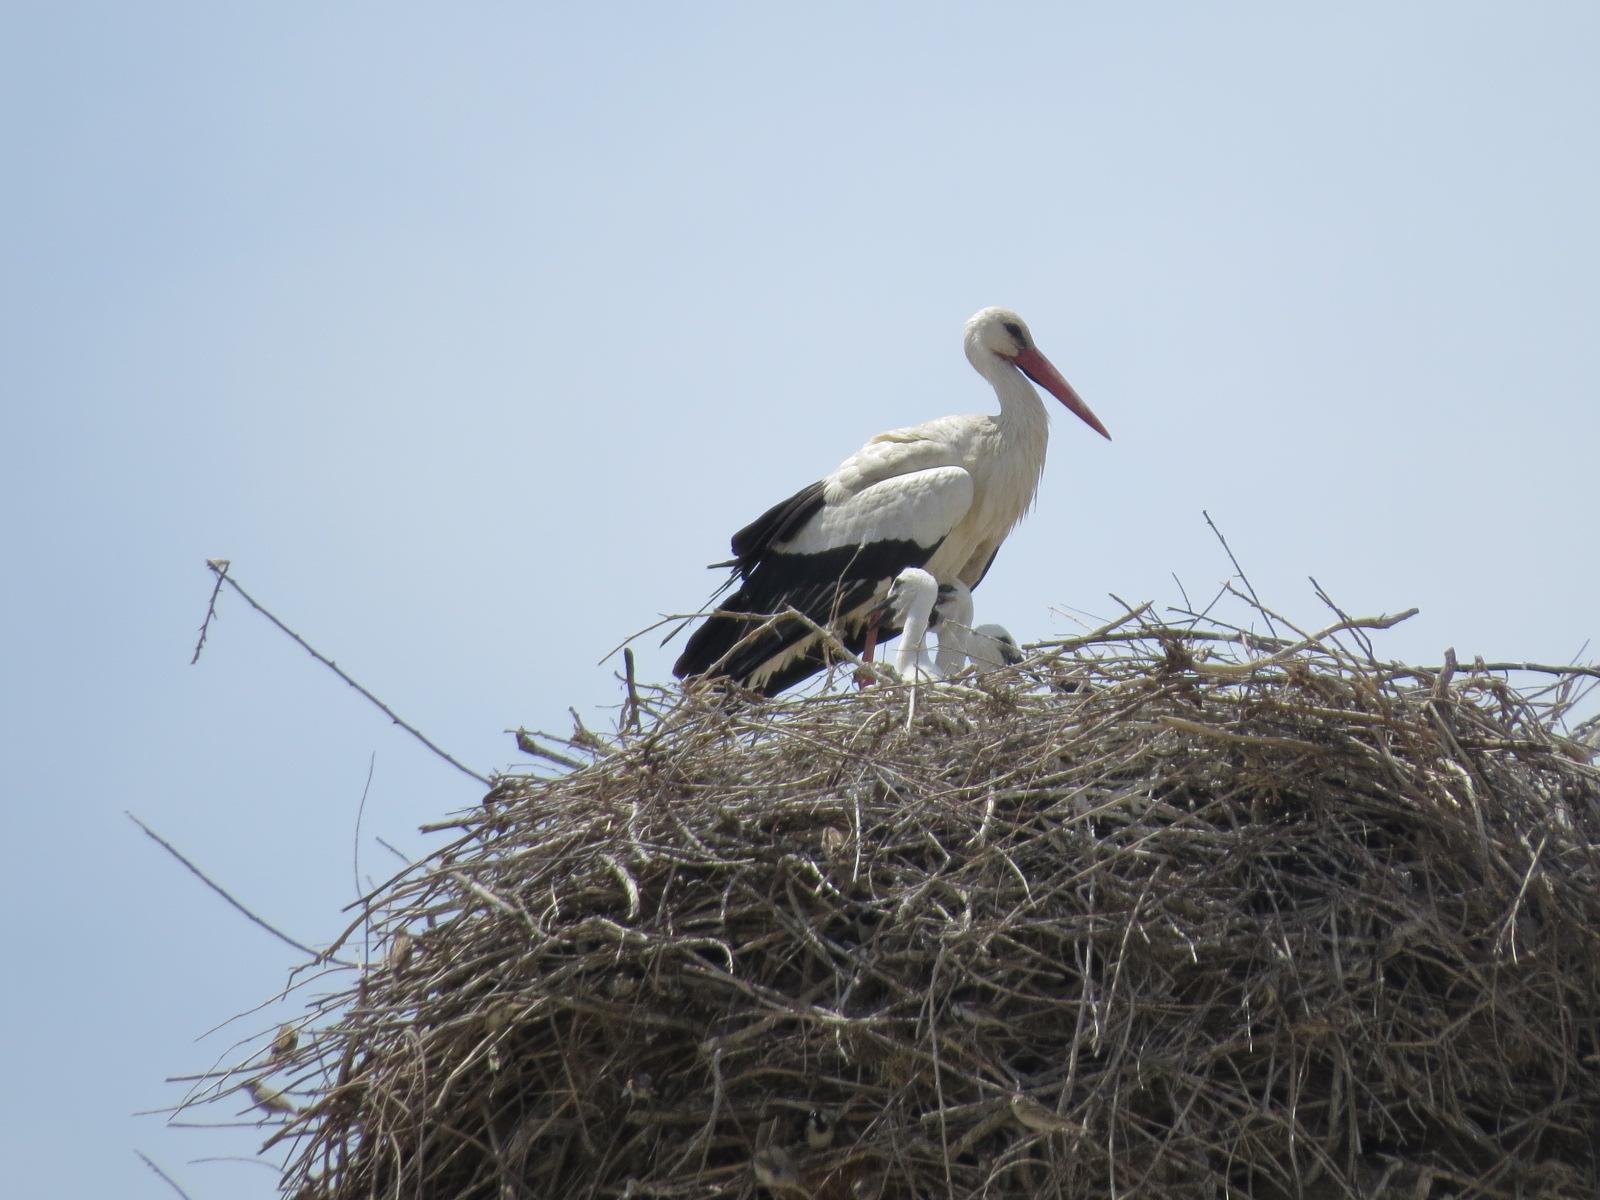 Real storks!